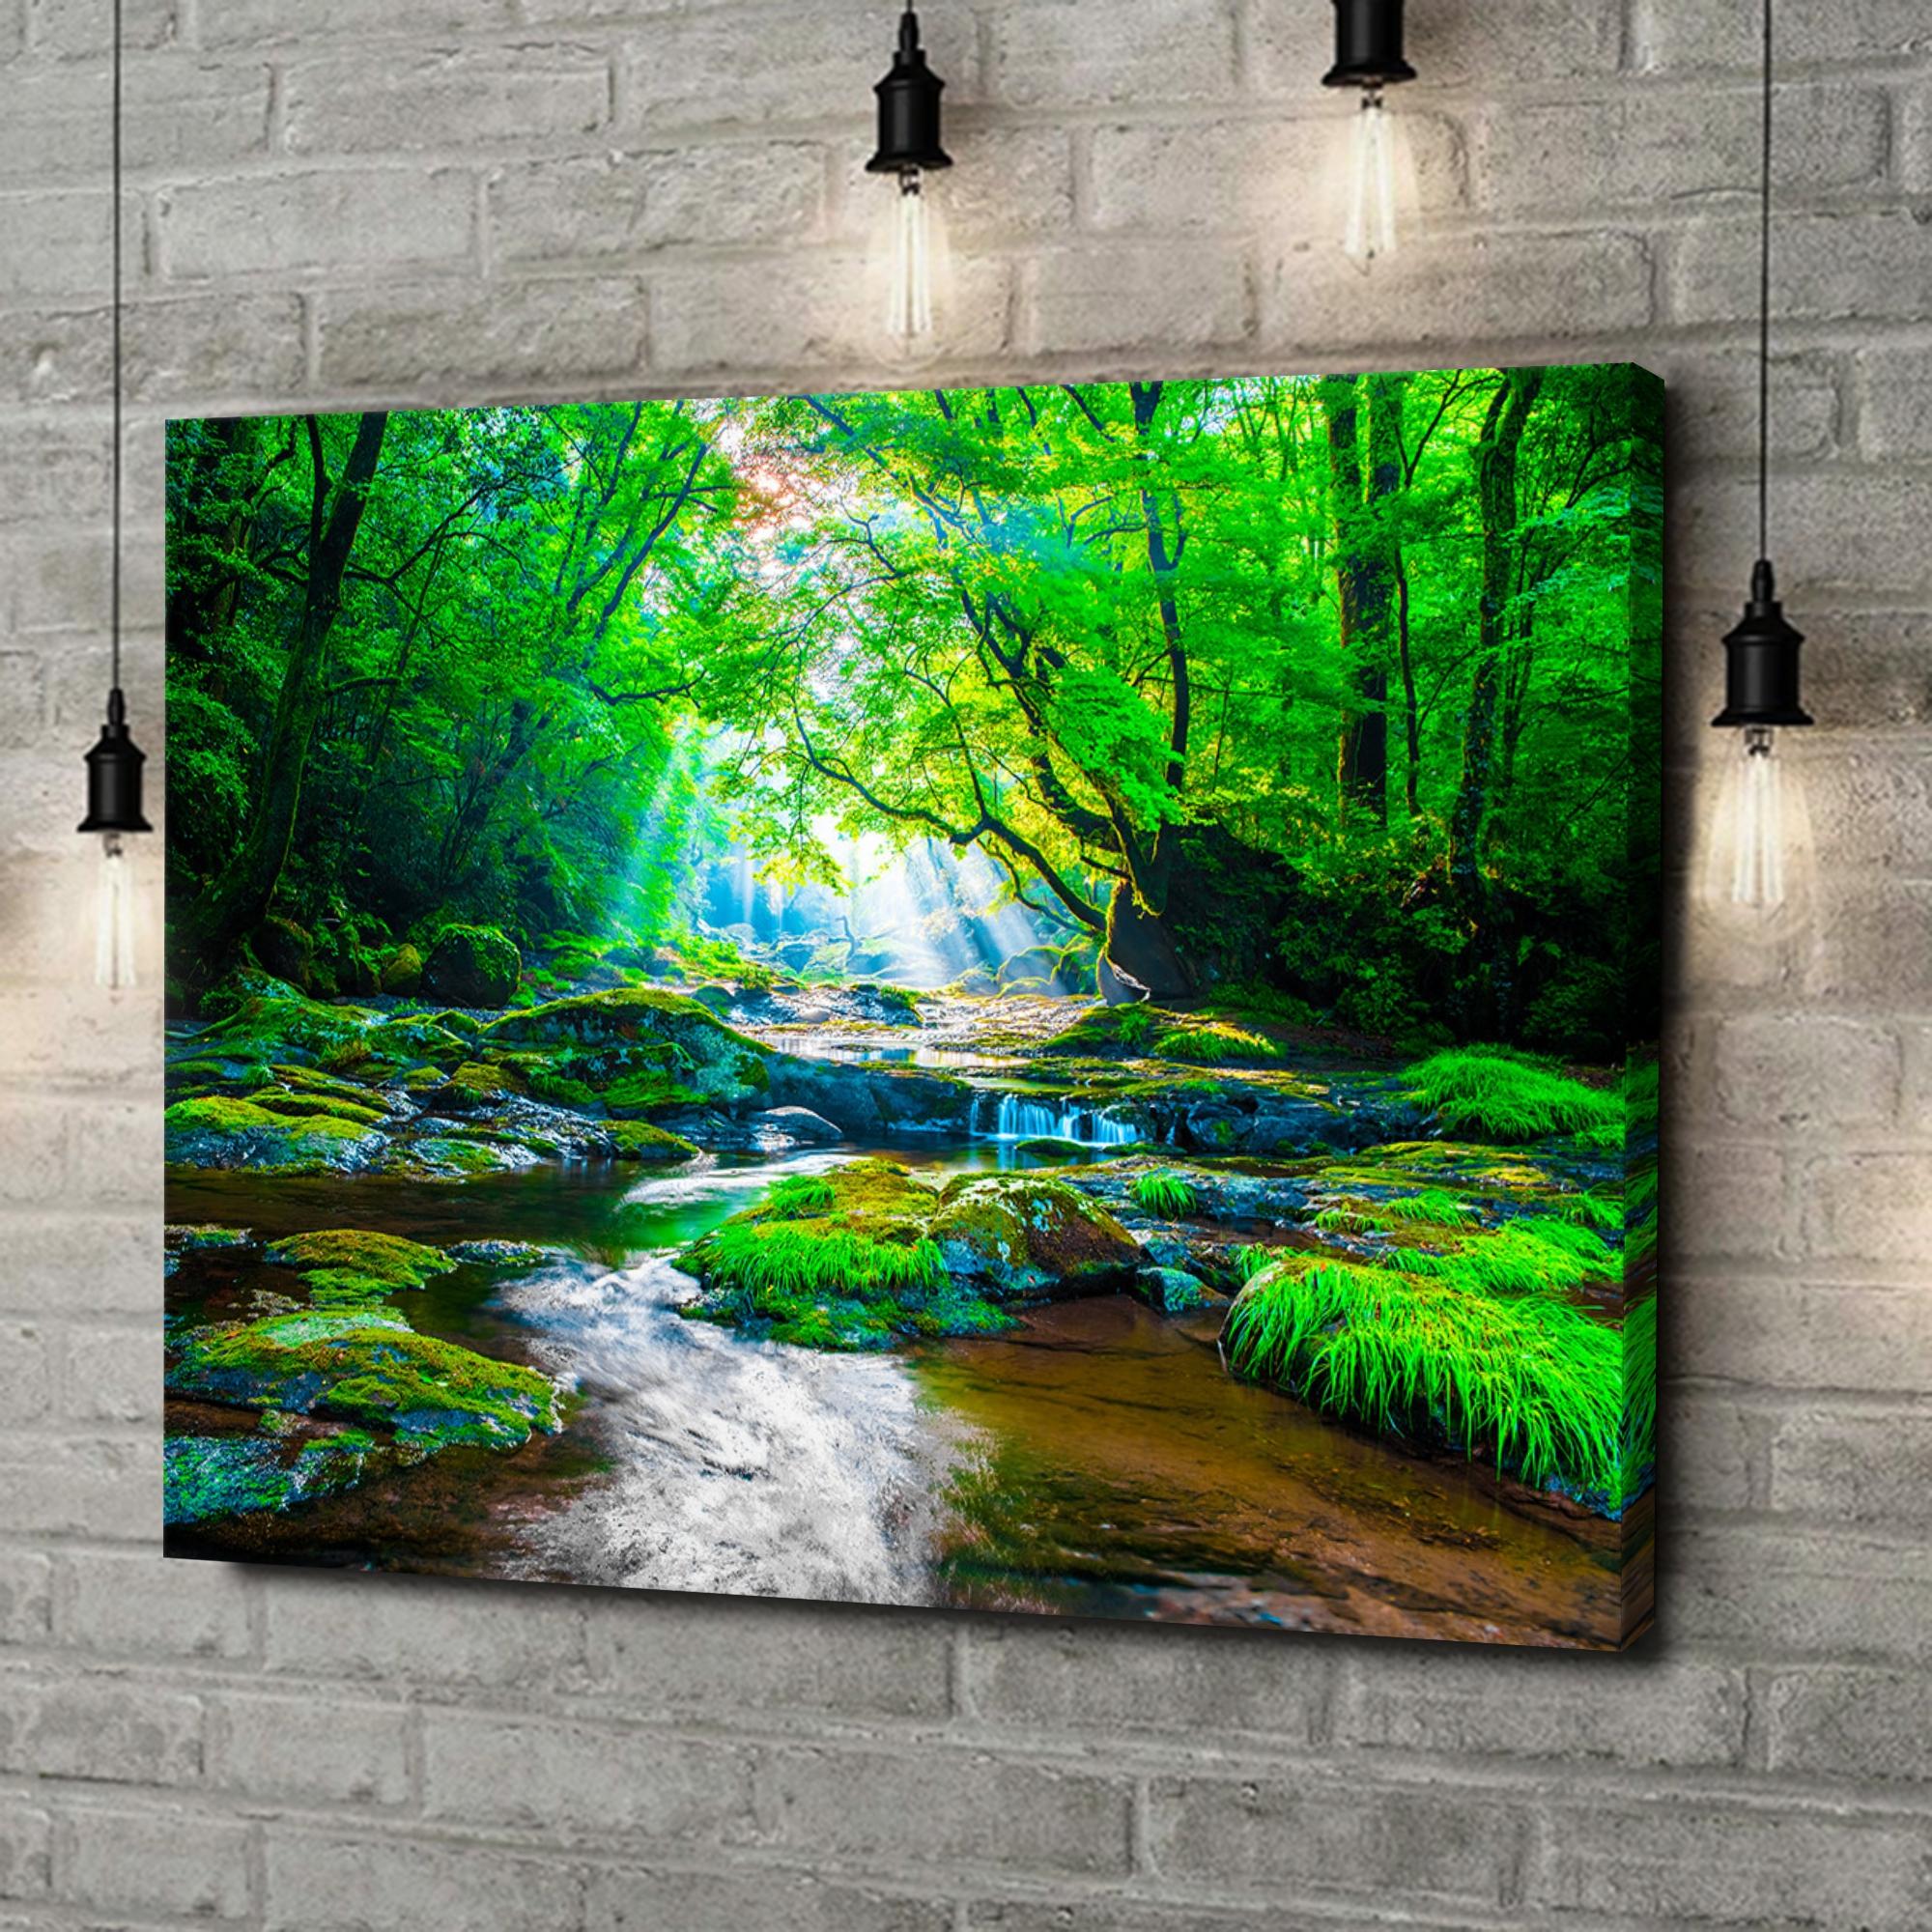 Leinwandbild personalisiert Kikuchi Valley Regenwald Japan